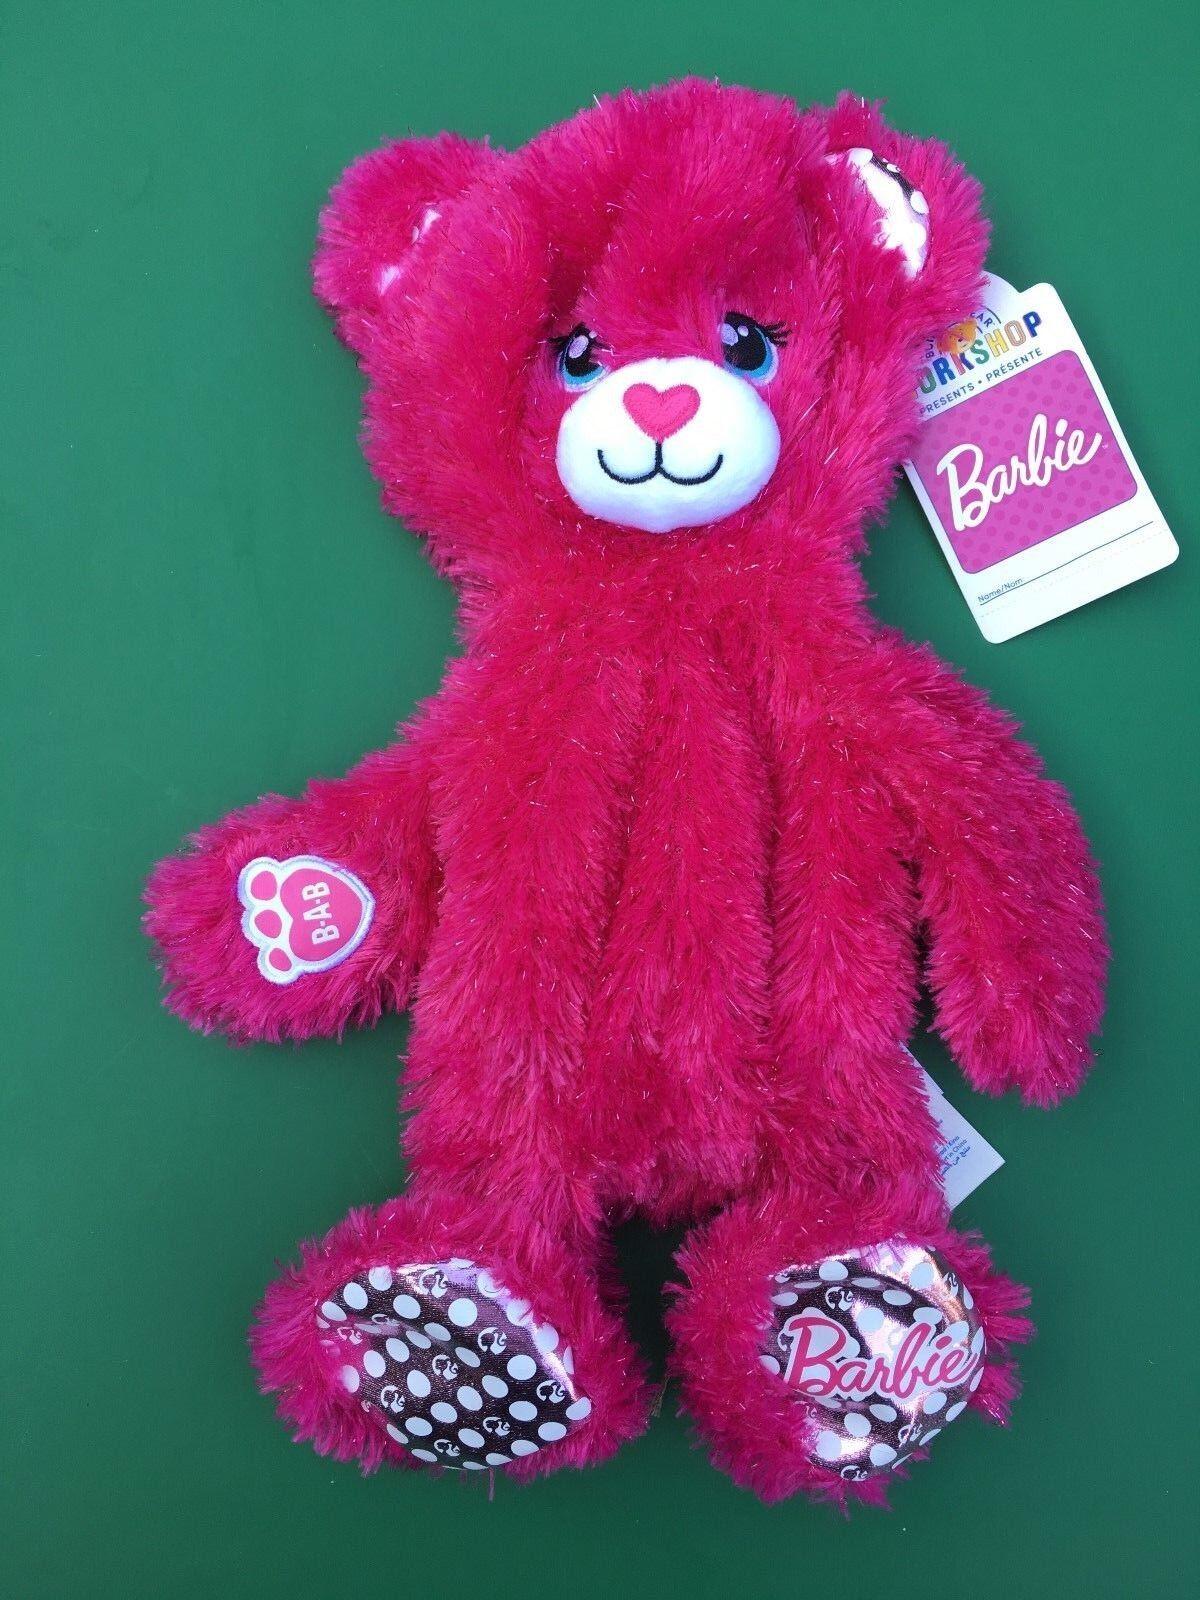 Build a Bear 16  Barbie Bear Plush Toy - Unstuffed - NWT